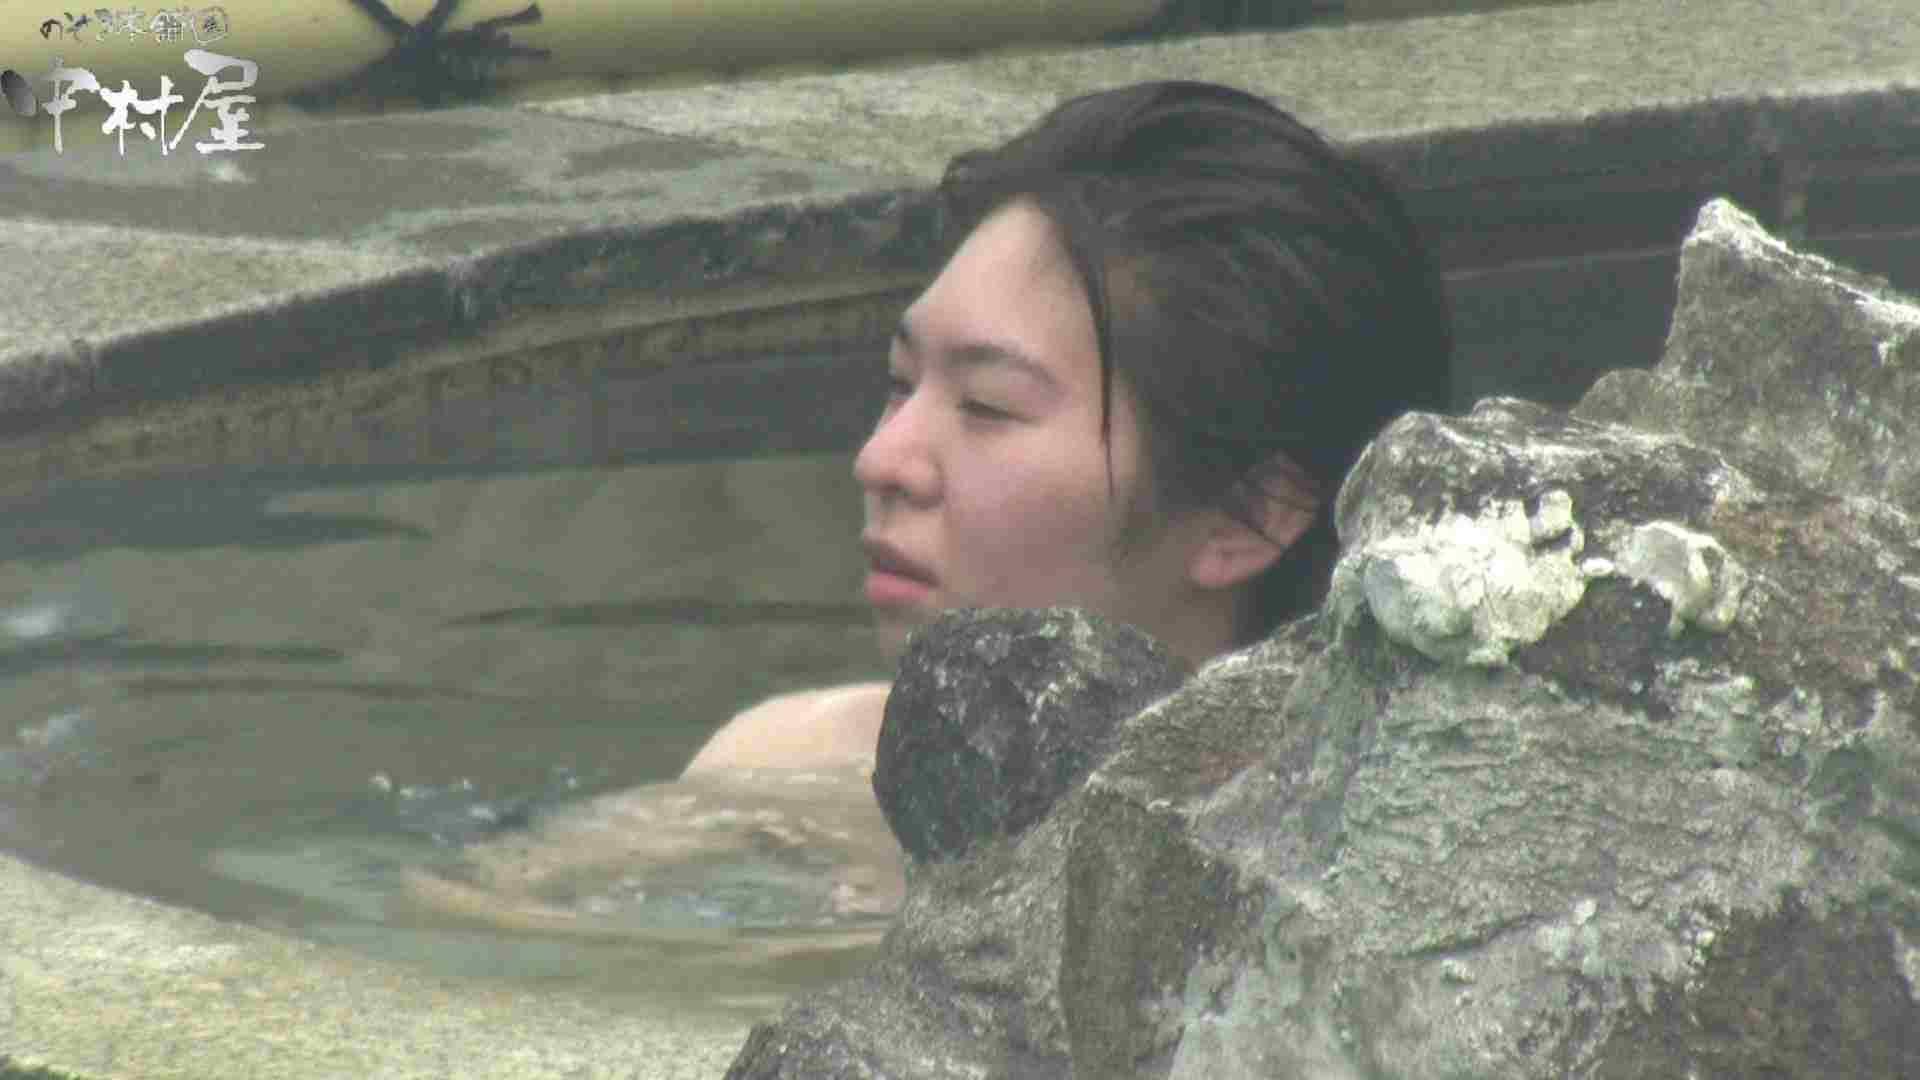 Aquaな露天風呂Vol.907 OL女体  95連発 36